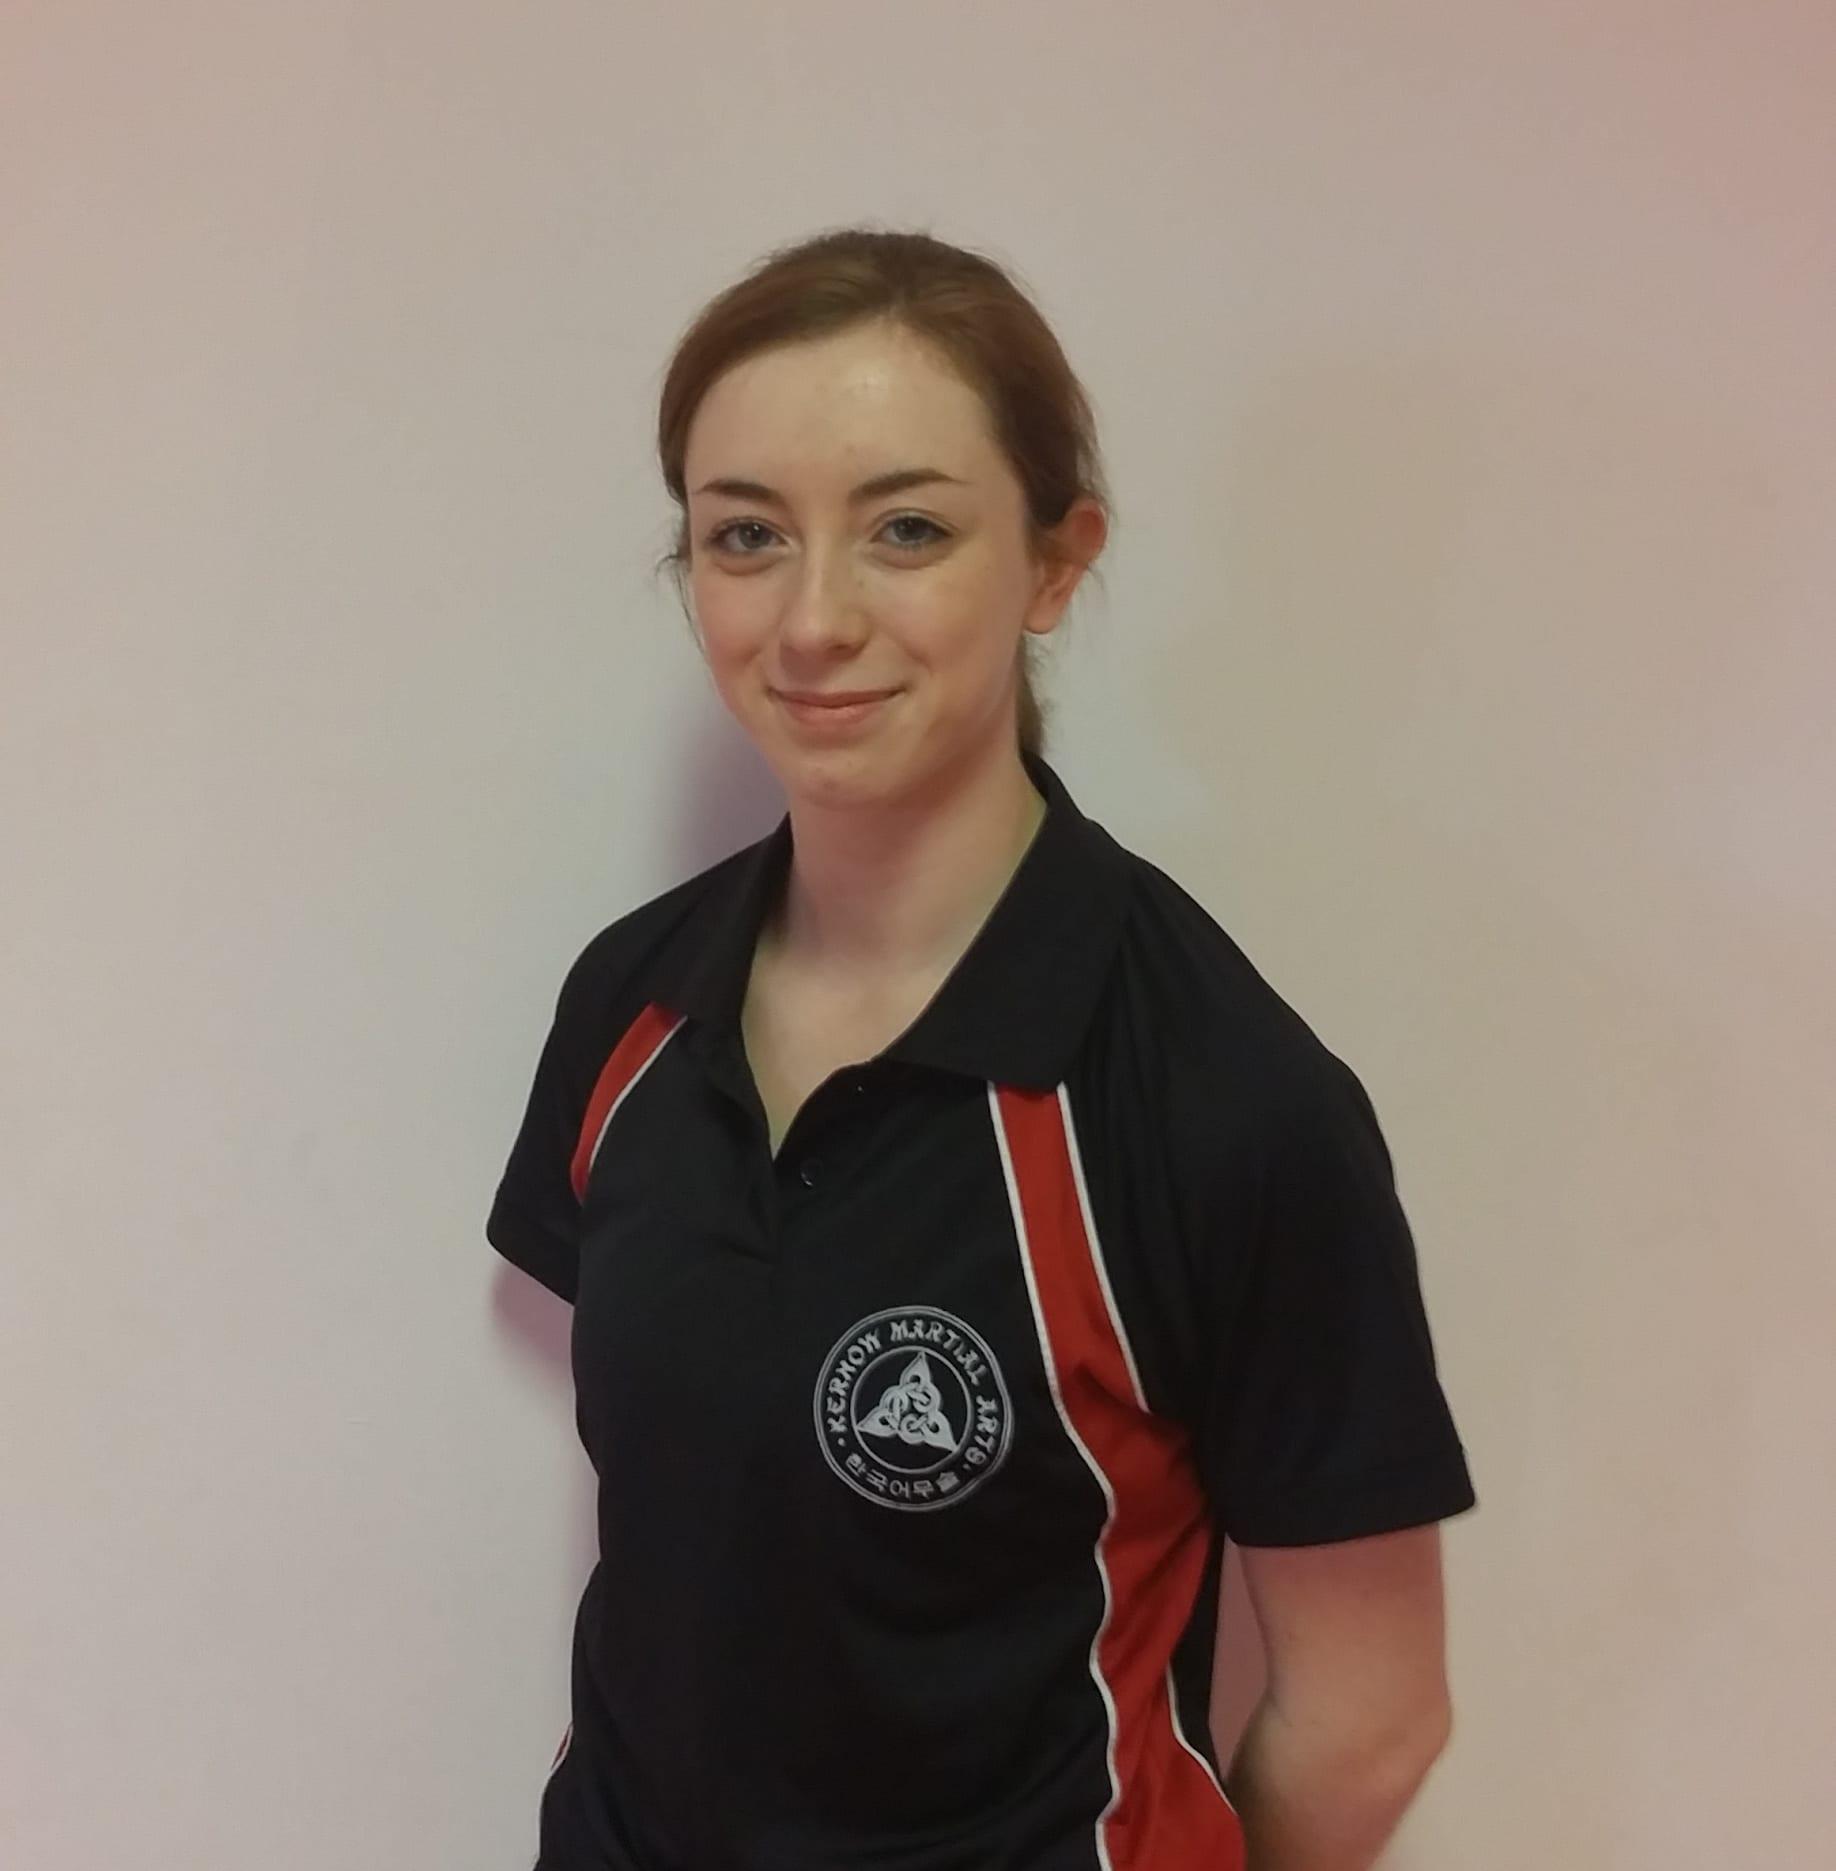 Ellena Harrison in St. Austell - Kernow Martial Arts